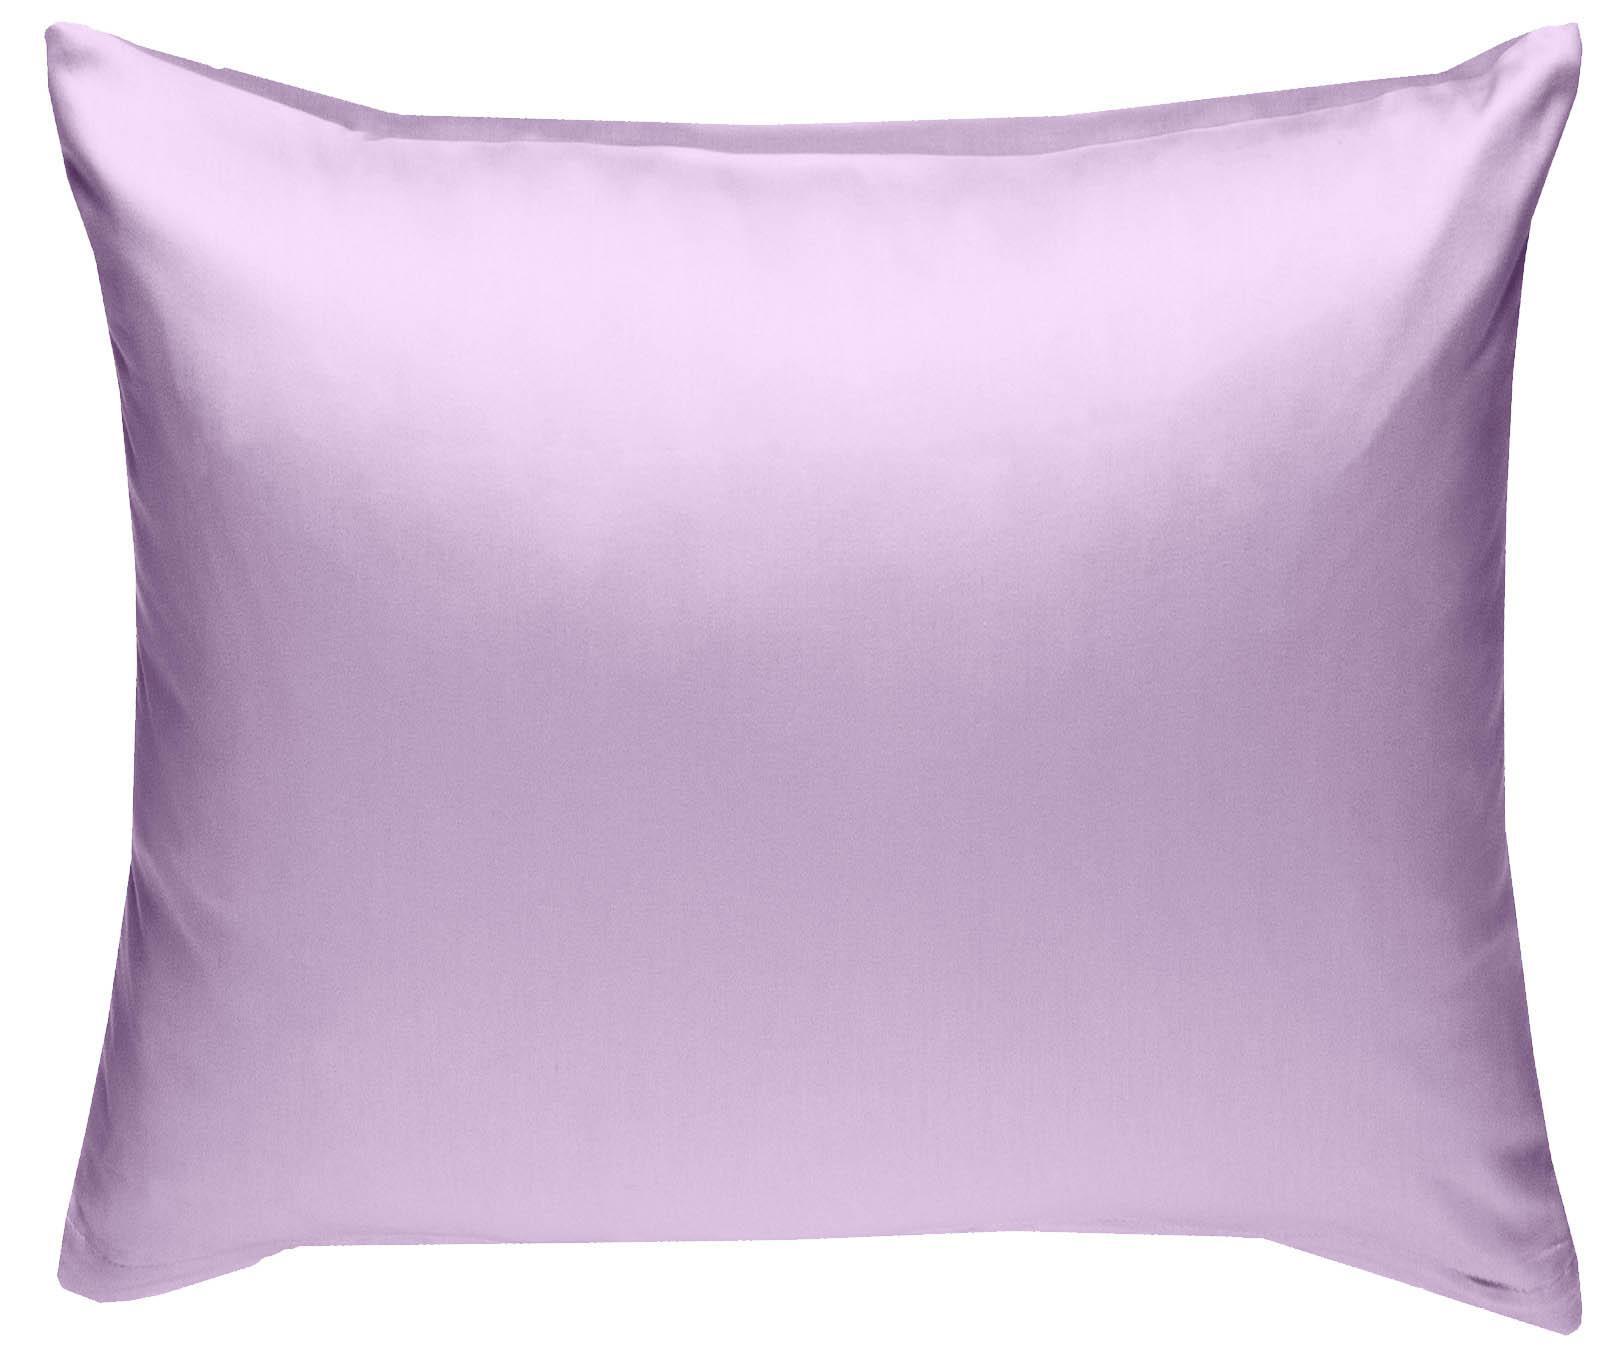 Mako Satin Kissenbezug uni flieder rosa 50x50 cm